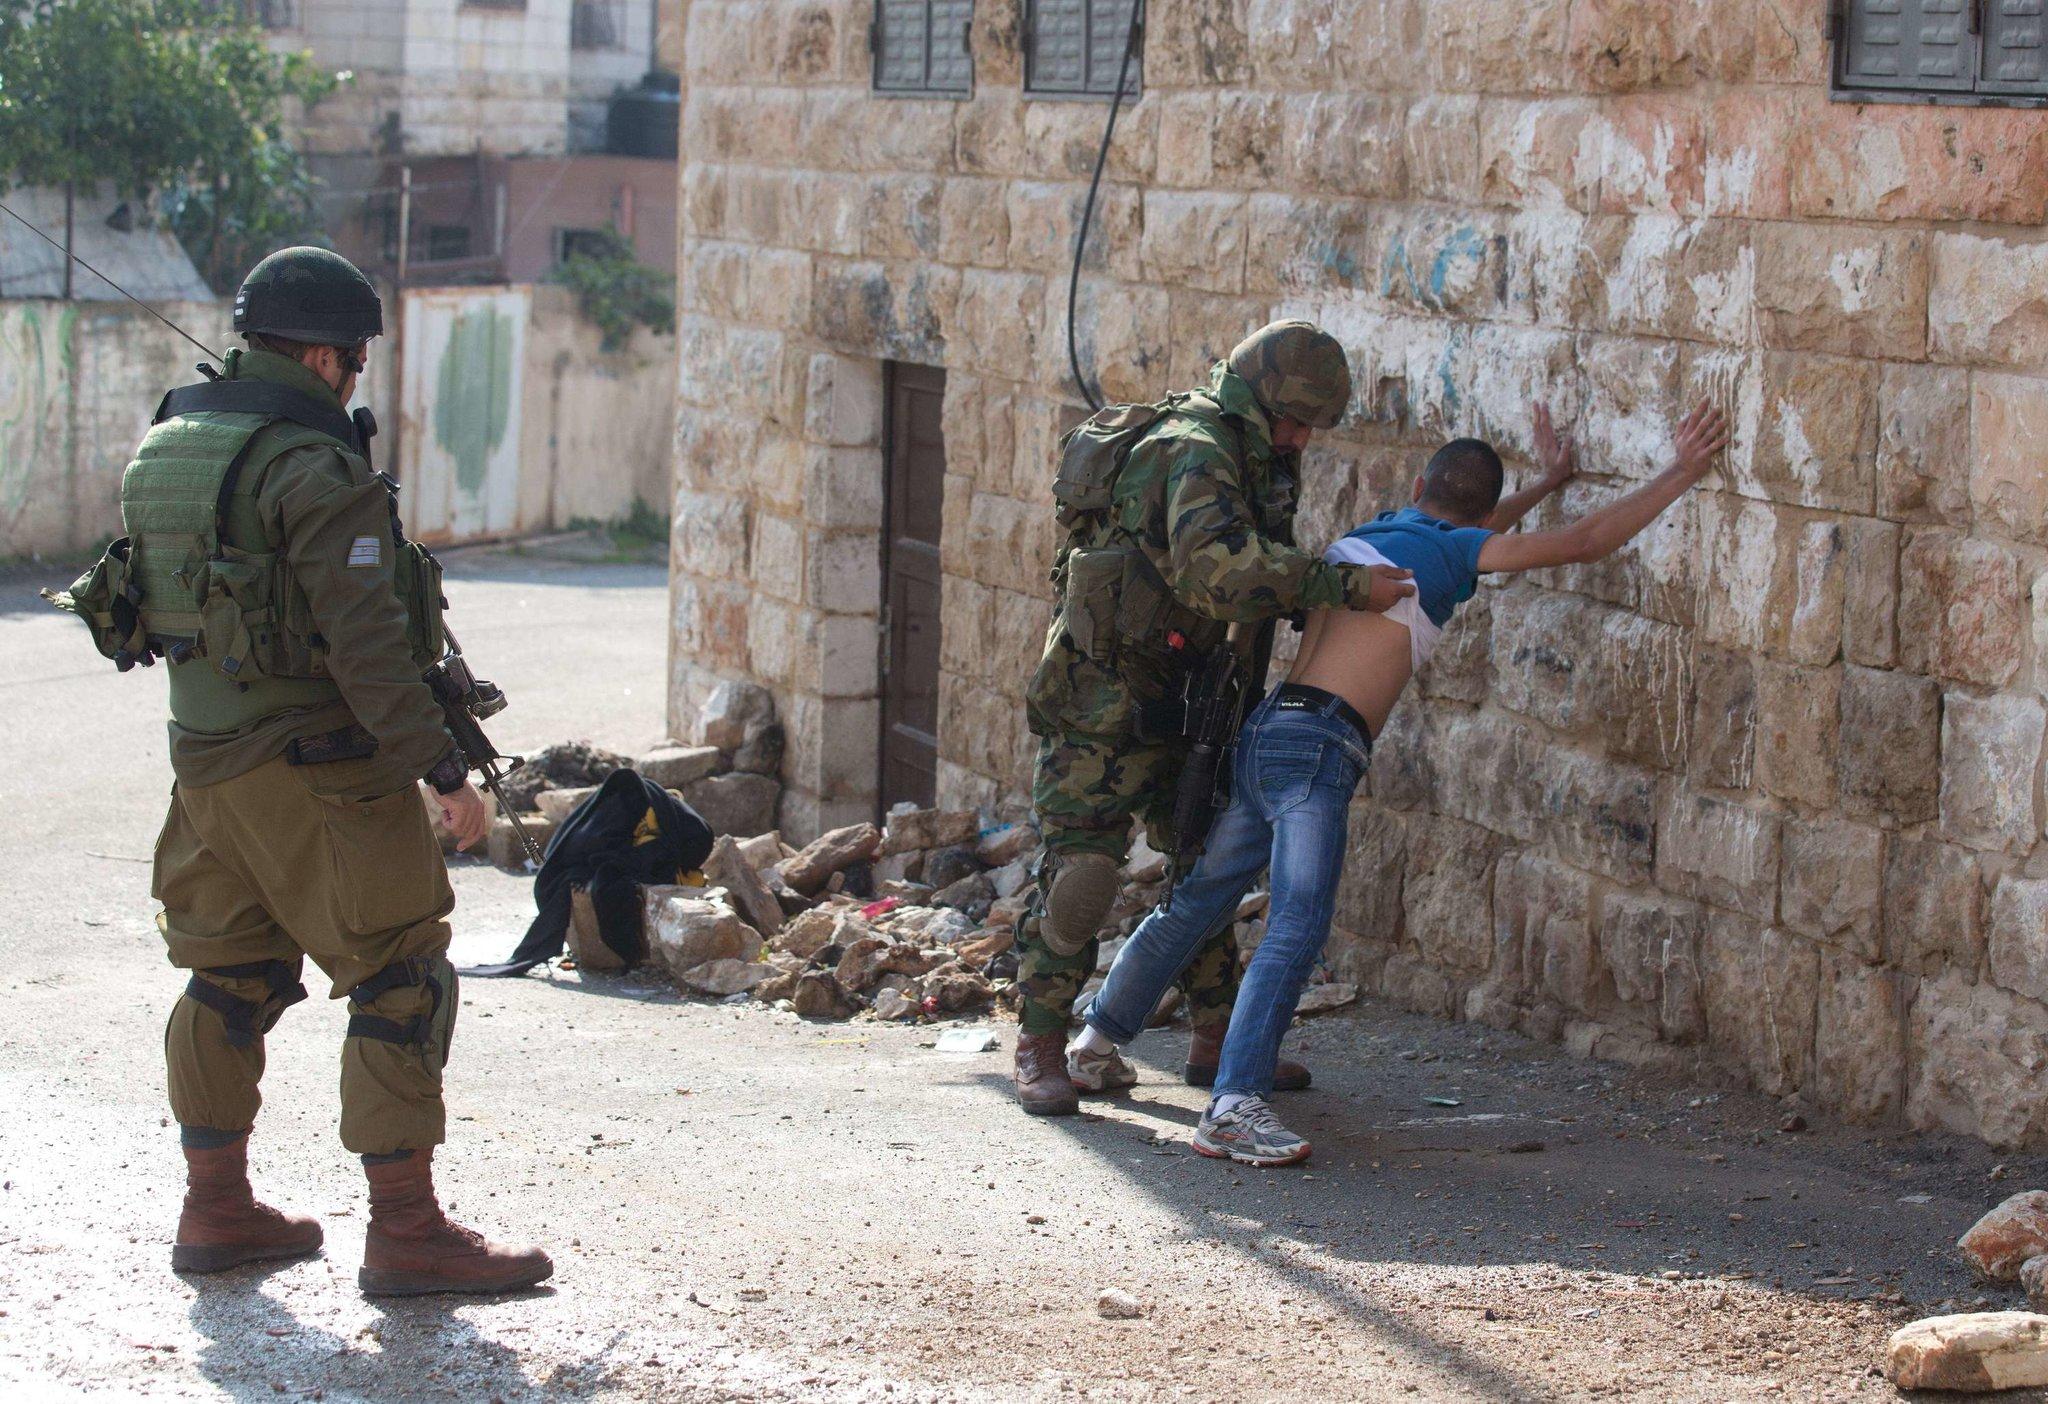 Israel - Army arrests 20 Palestinians in West Bank using Pegasus spyware